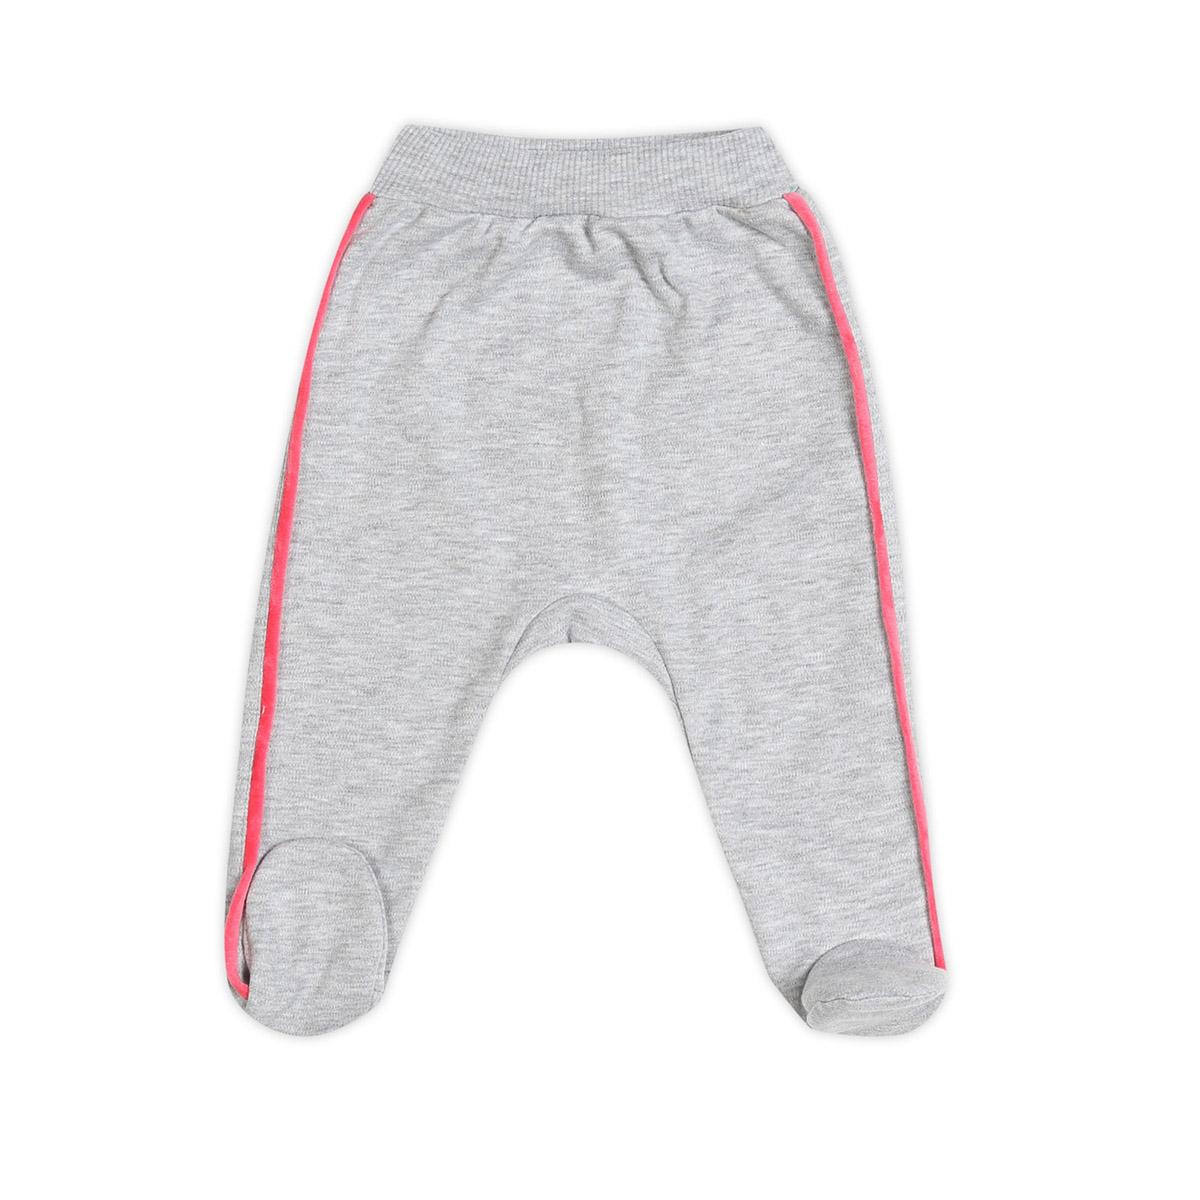 Ползунки с ножками Ёмаё Спорт (26-265) рост 74 серый меланж<br>